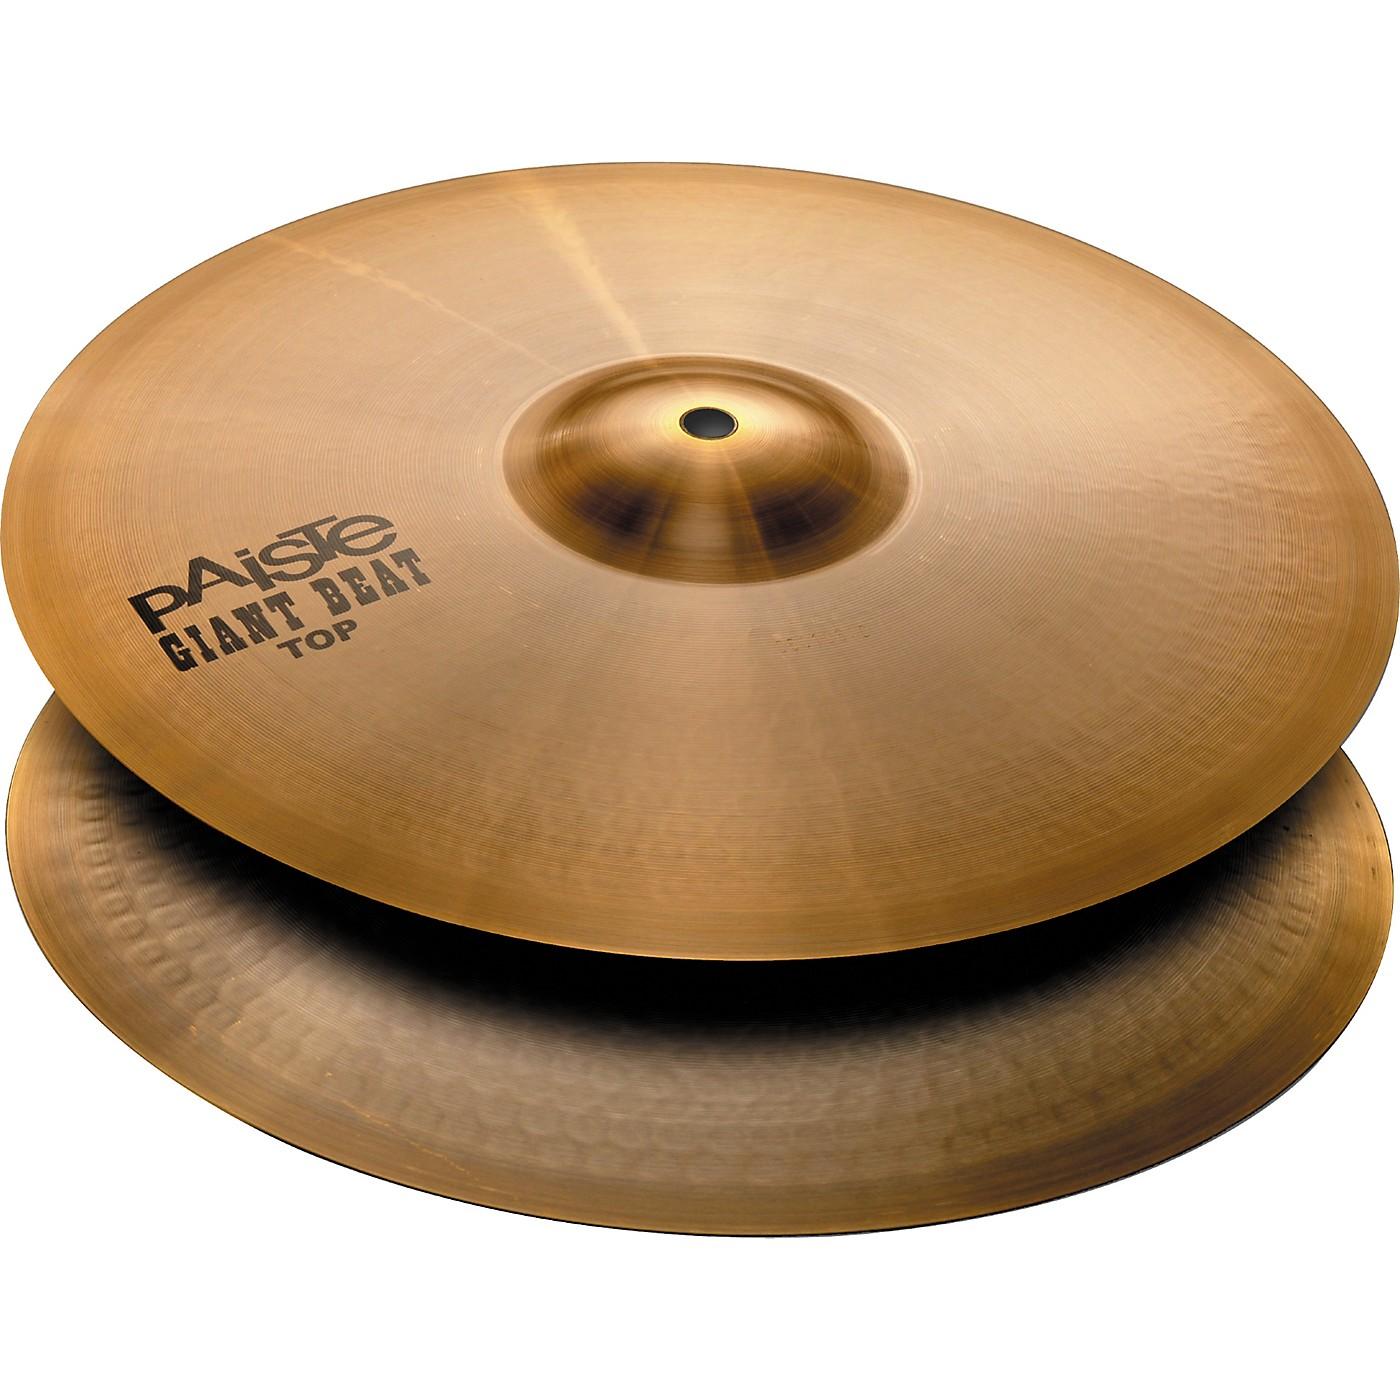 Paiste Giant Beat Hi-Hats thumbnail